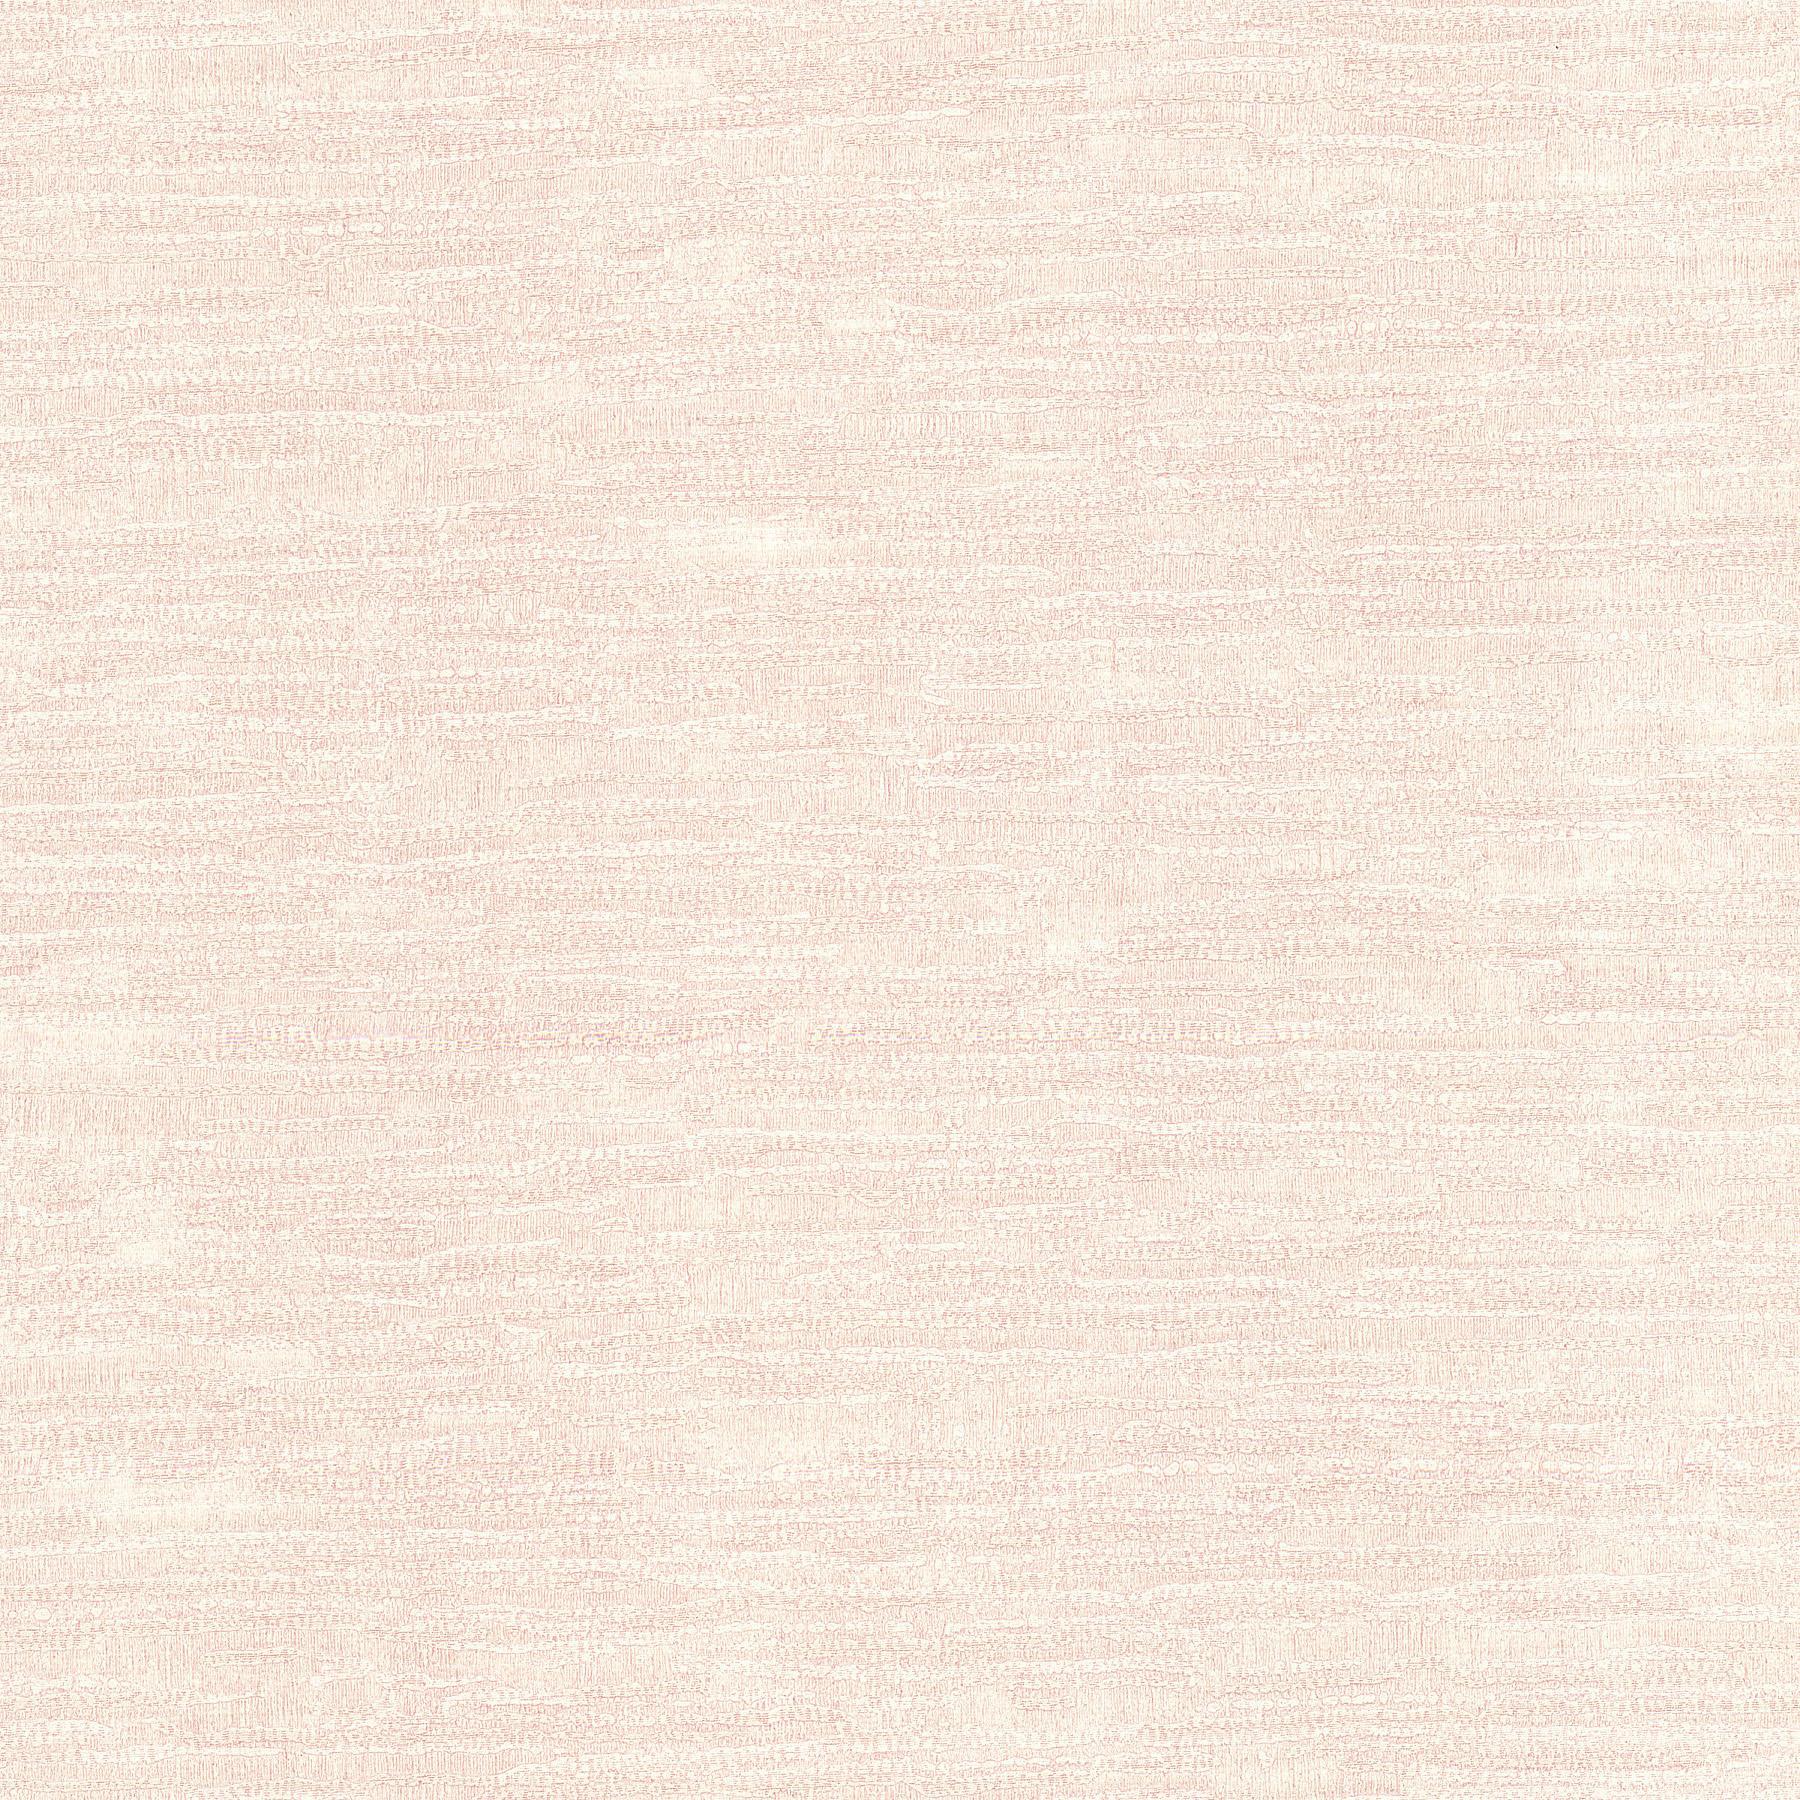 Brewster wallpaper umbria light pink stucco texture for Lightweight stucco